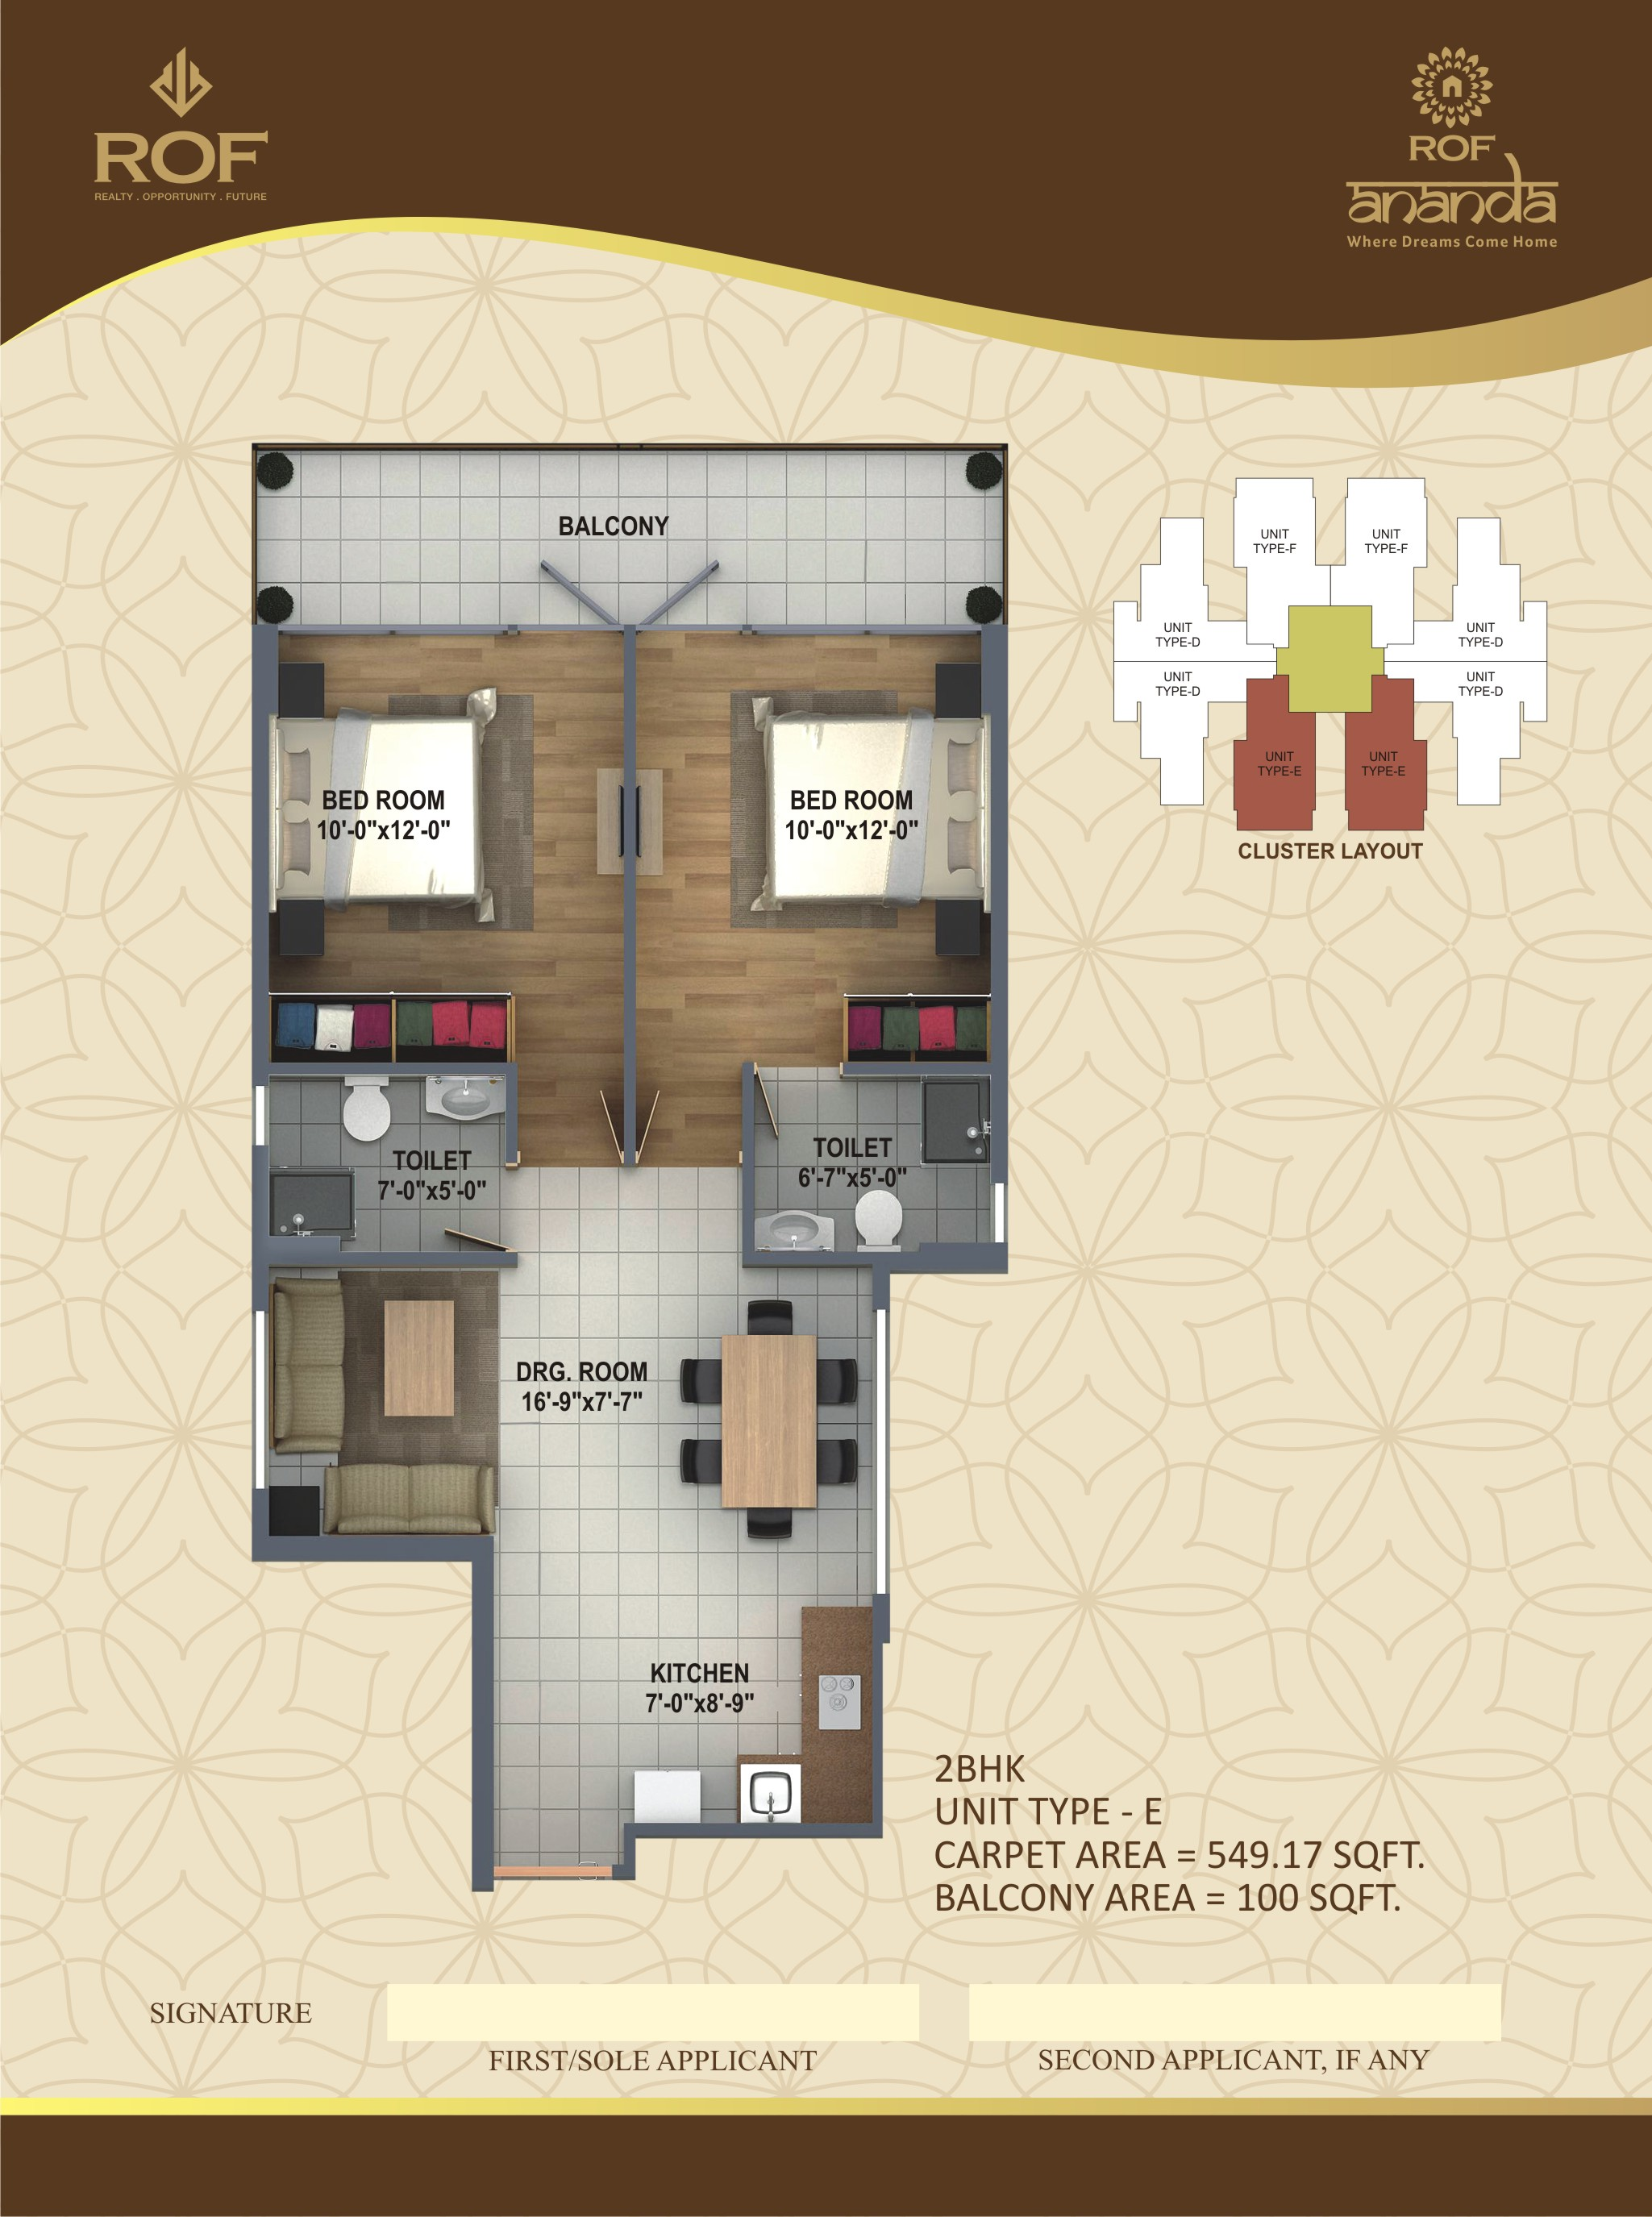 ROF Ramada Ananda Affordable Housing Sector 95 Gurgaon